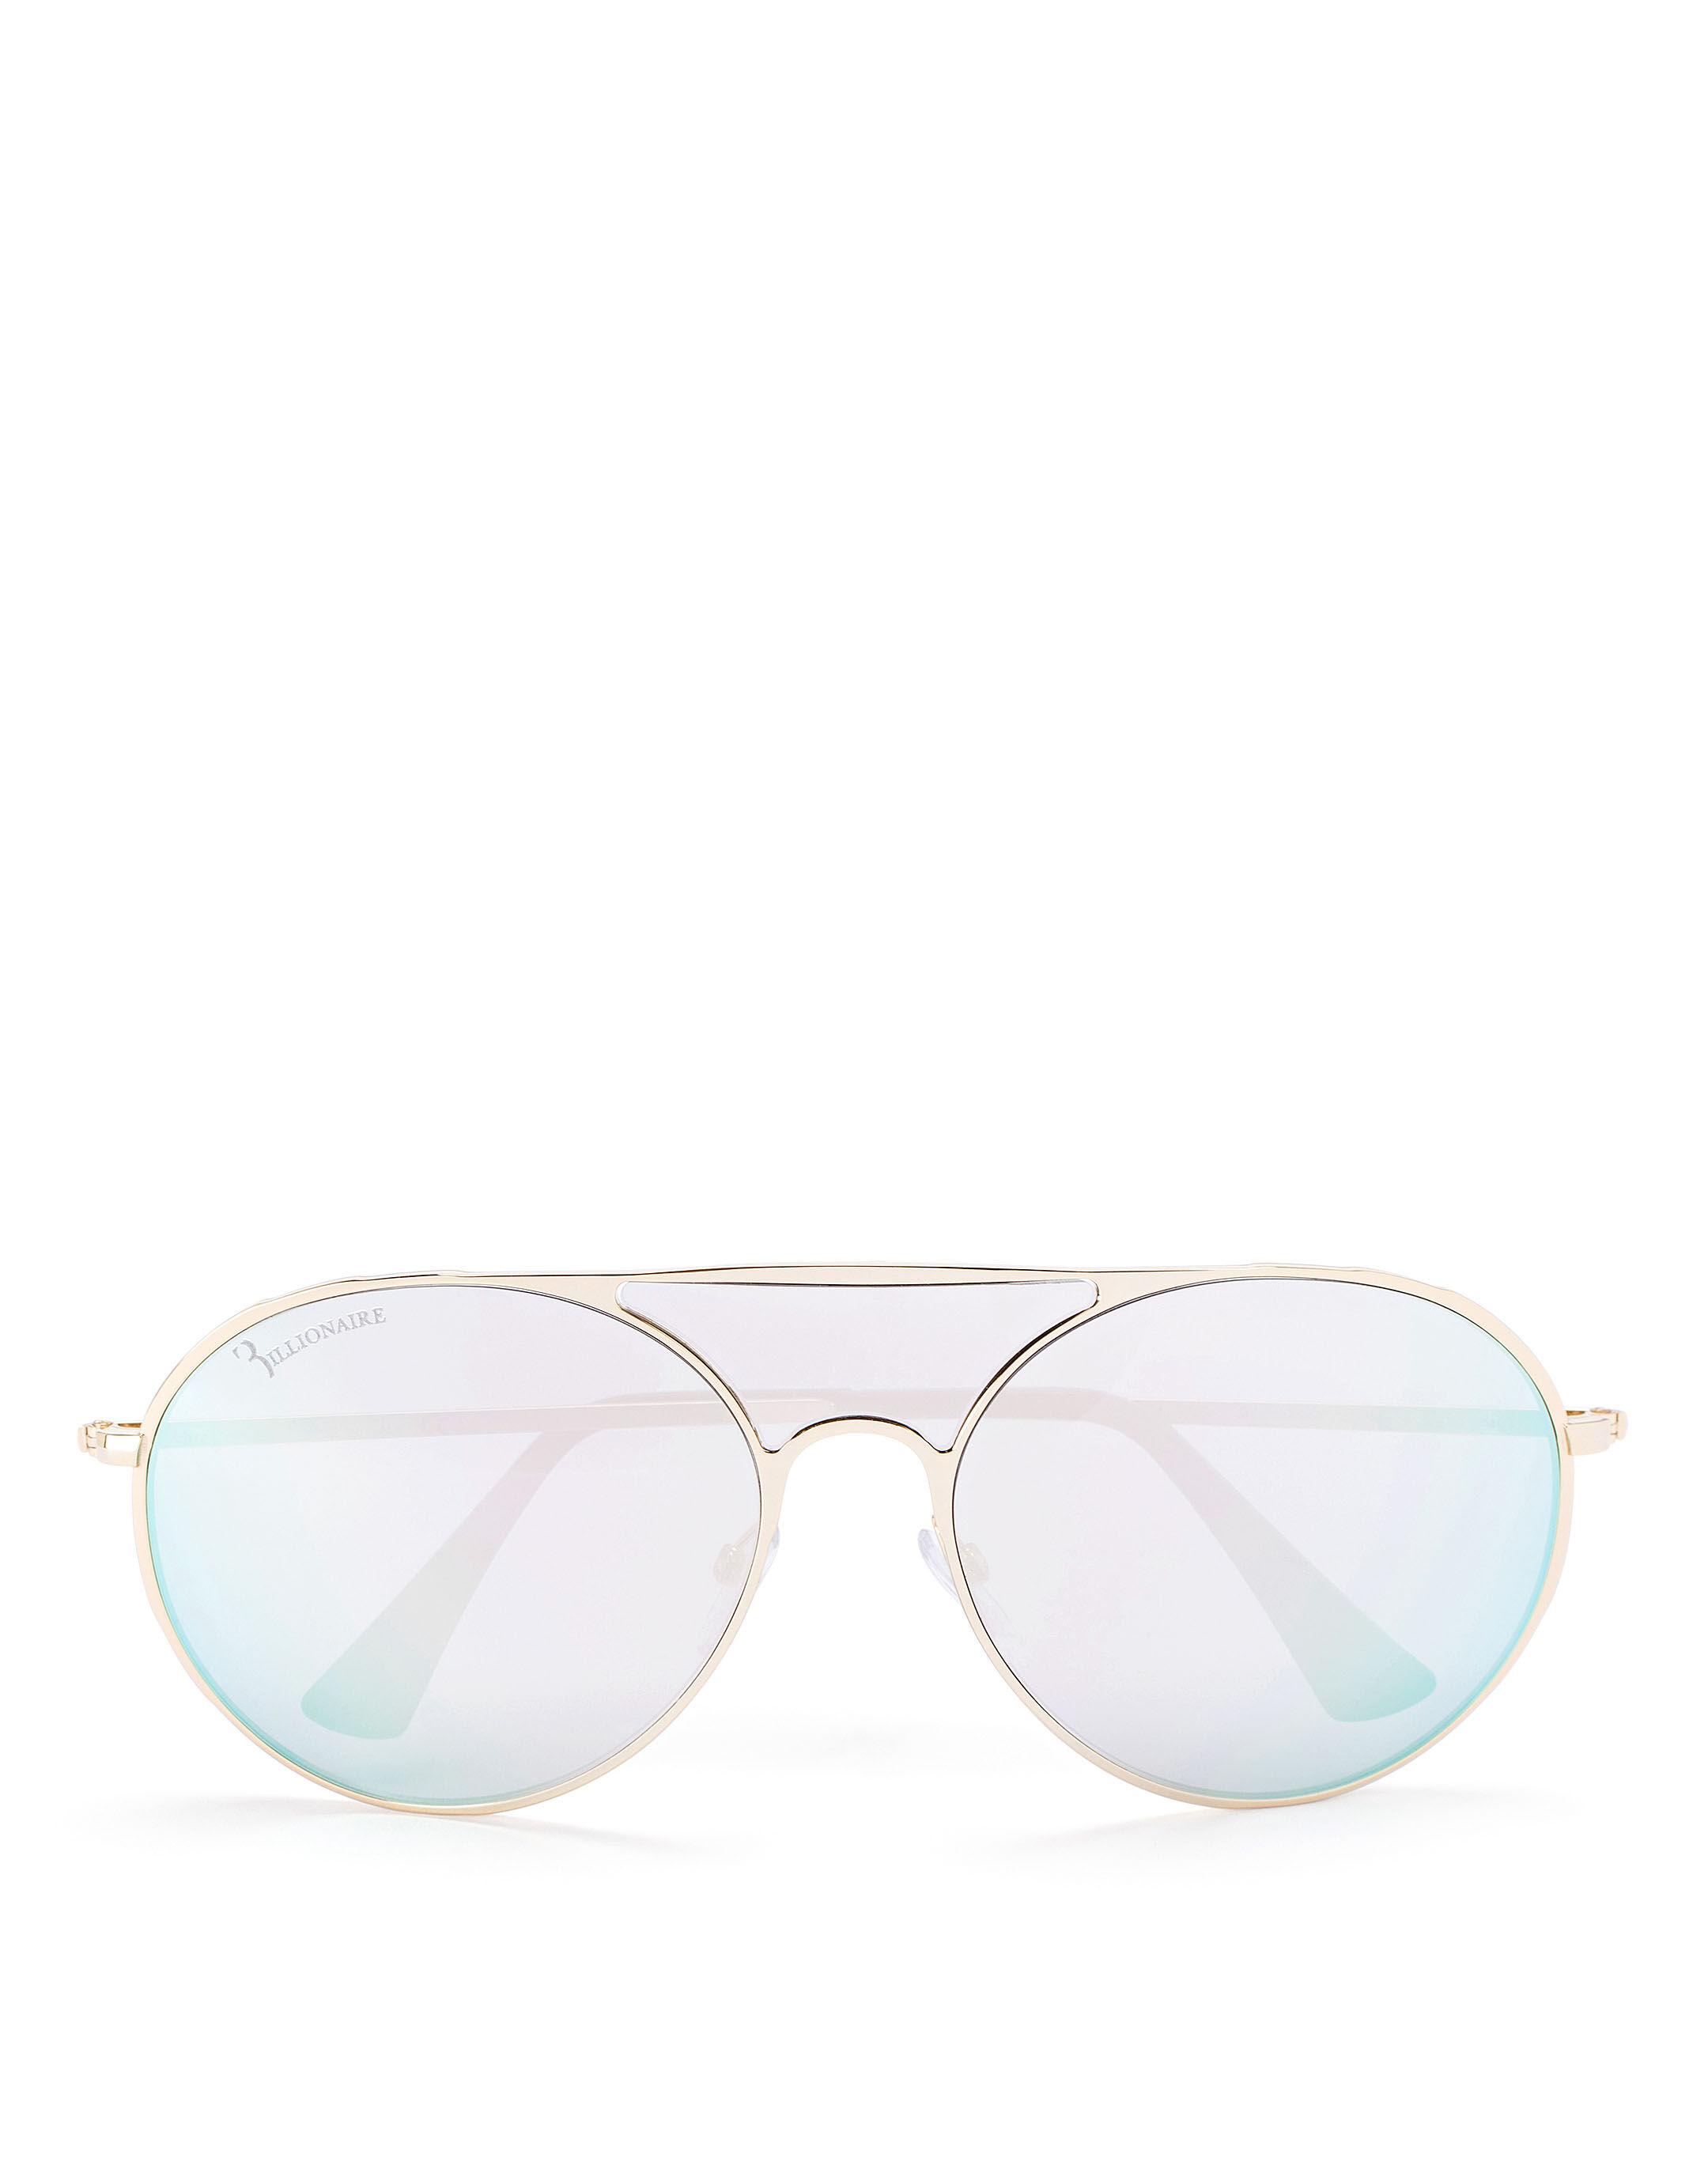 men s eyewear billionaire S&W 645 Parts sunglasses luxury sunglasses